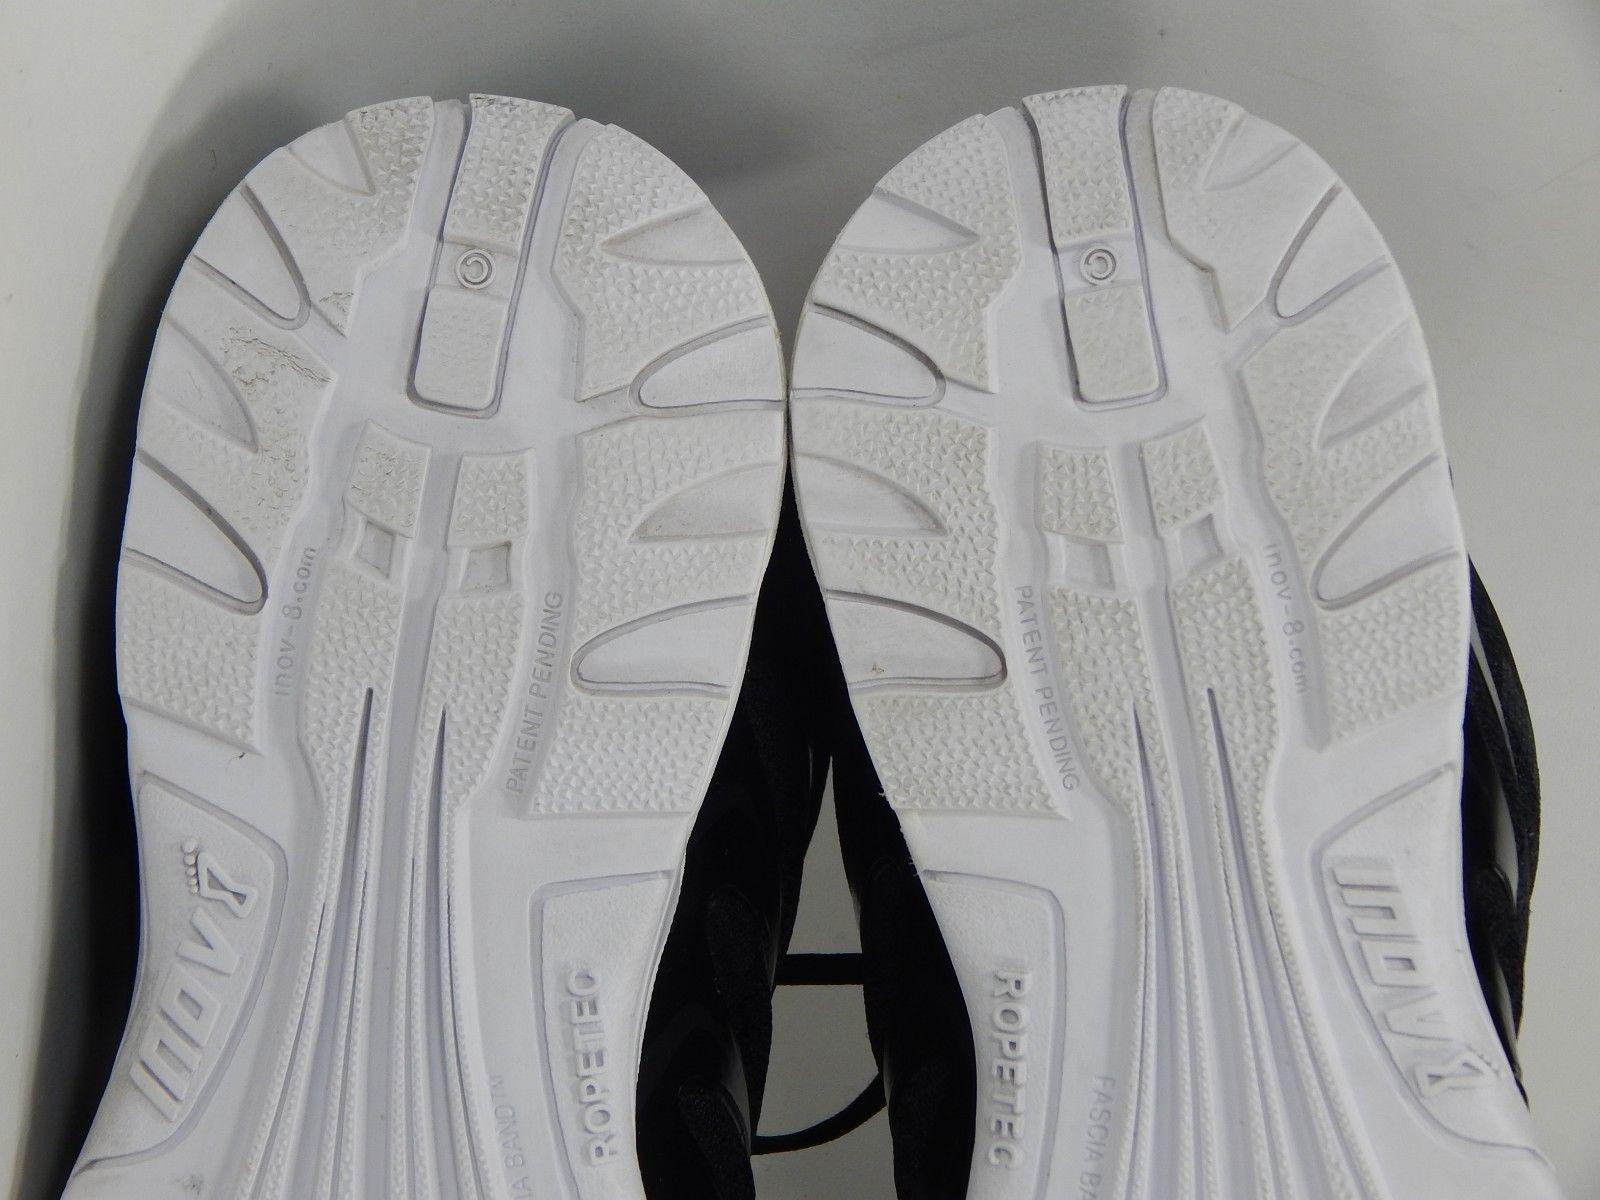 Inov-8 F-Lite 195 Size US 9.5 M (B) EU 40.5 Women's Cross Fit Running Shoes